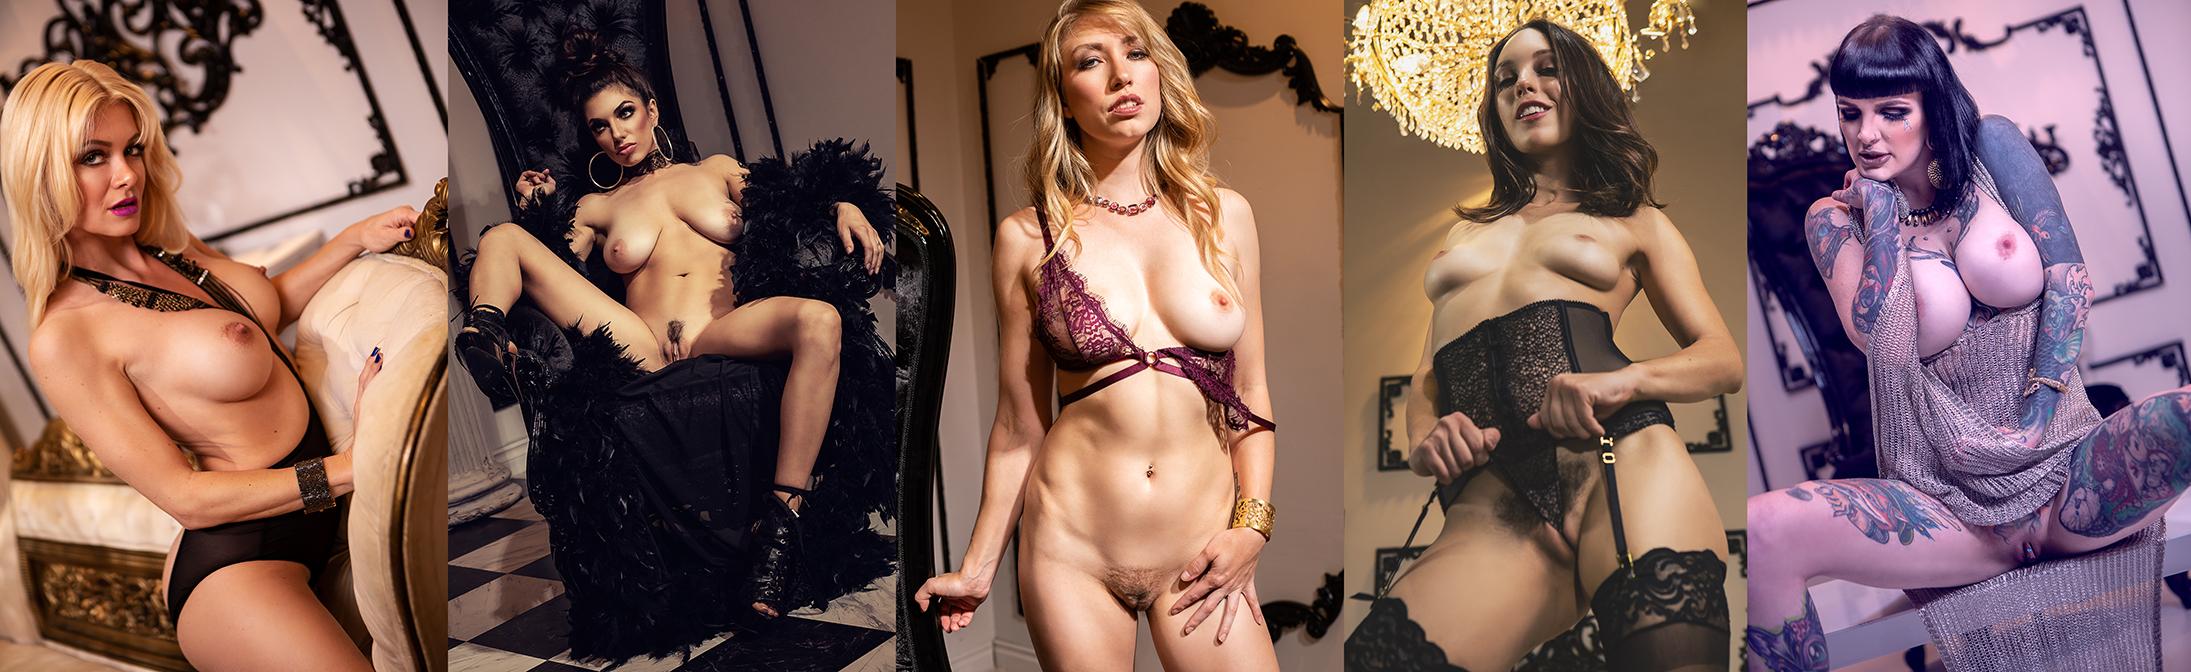 nude art, nude video, masturbation porn, big tits, hairy pussy, Darcie Dolce, Verronica Kirei, Serene Siren, Jade Nile, Keighla Night